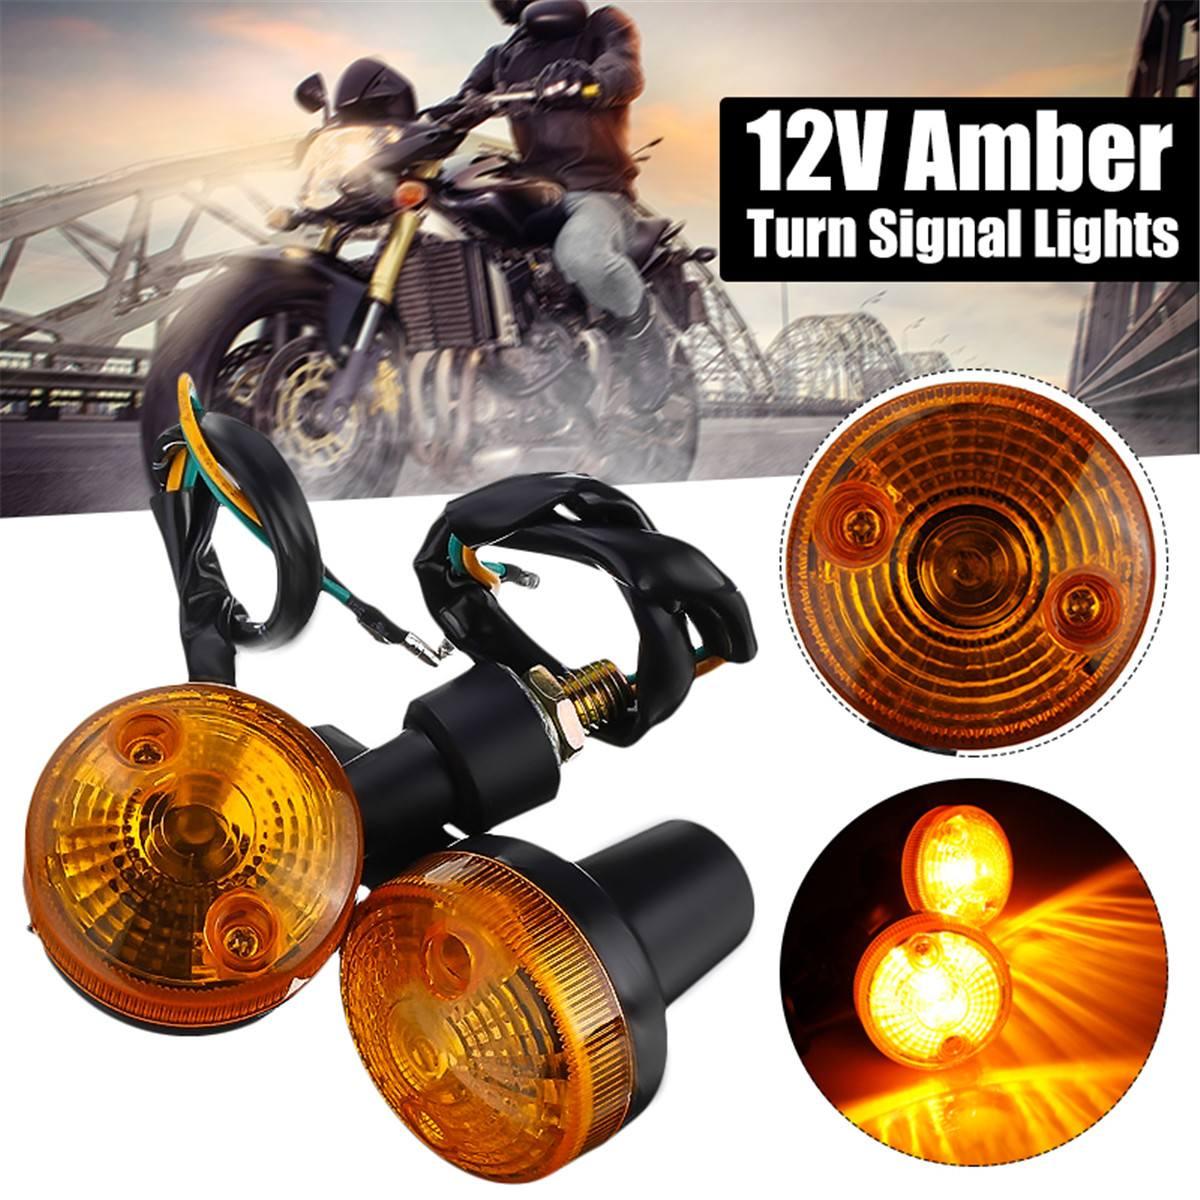 Universal Pairs 12V Auto Car Motorcycle Turn Signal Light Direction Indicator Lamp Amber For Honda/Kawasaki/Suzuki New